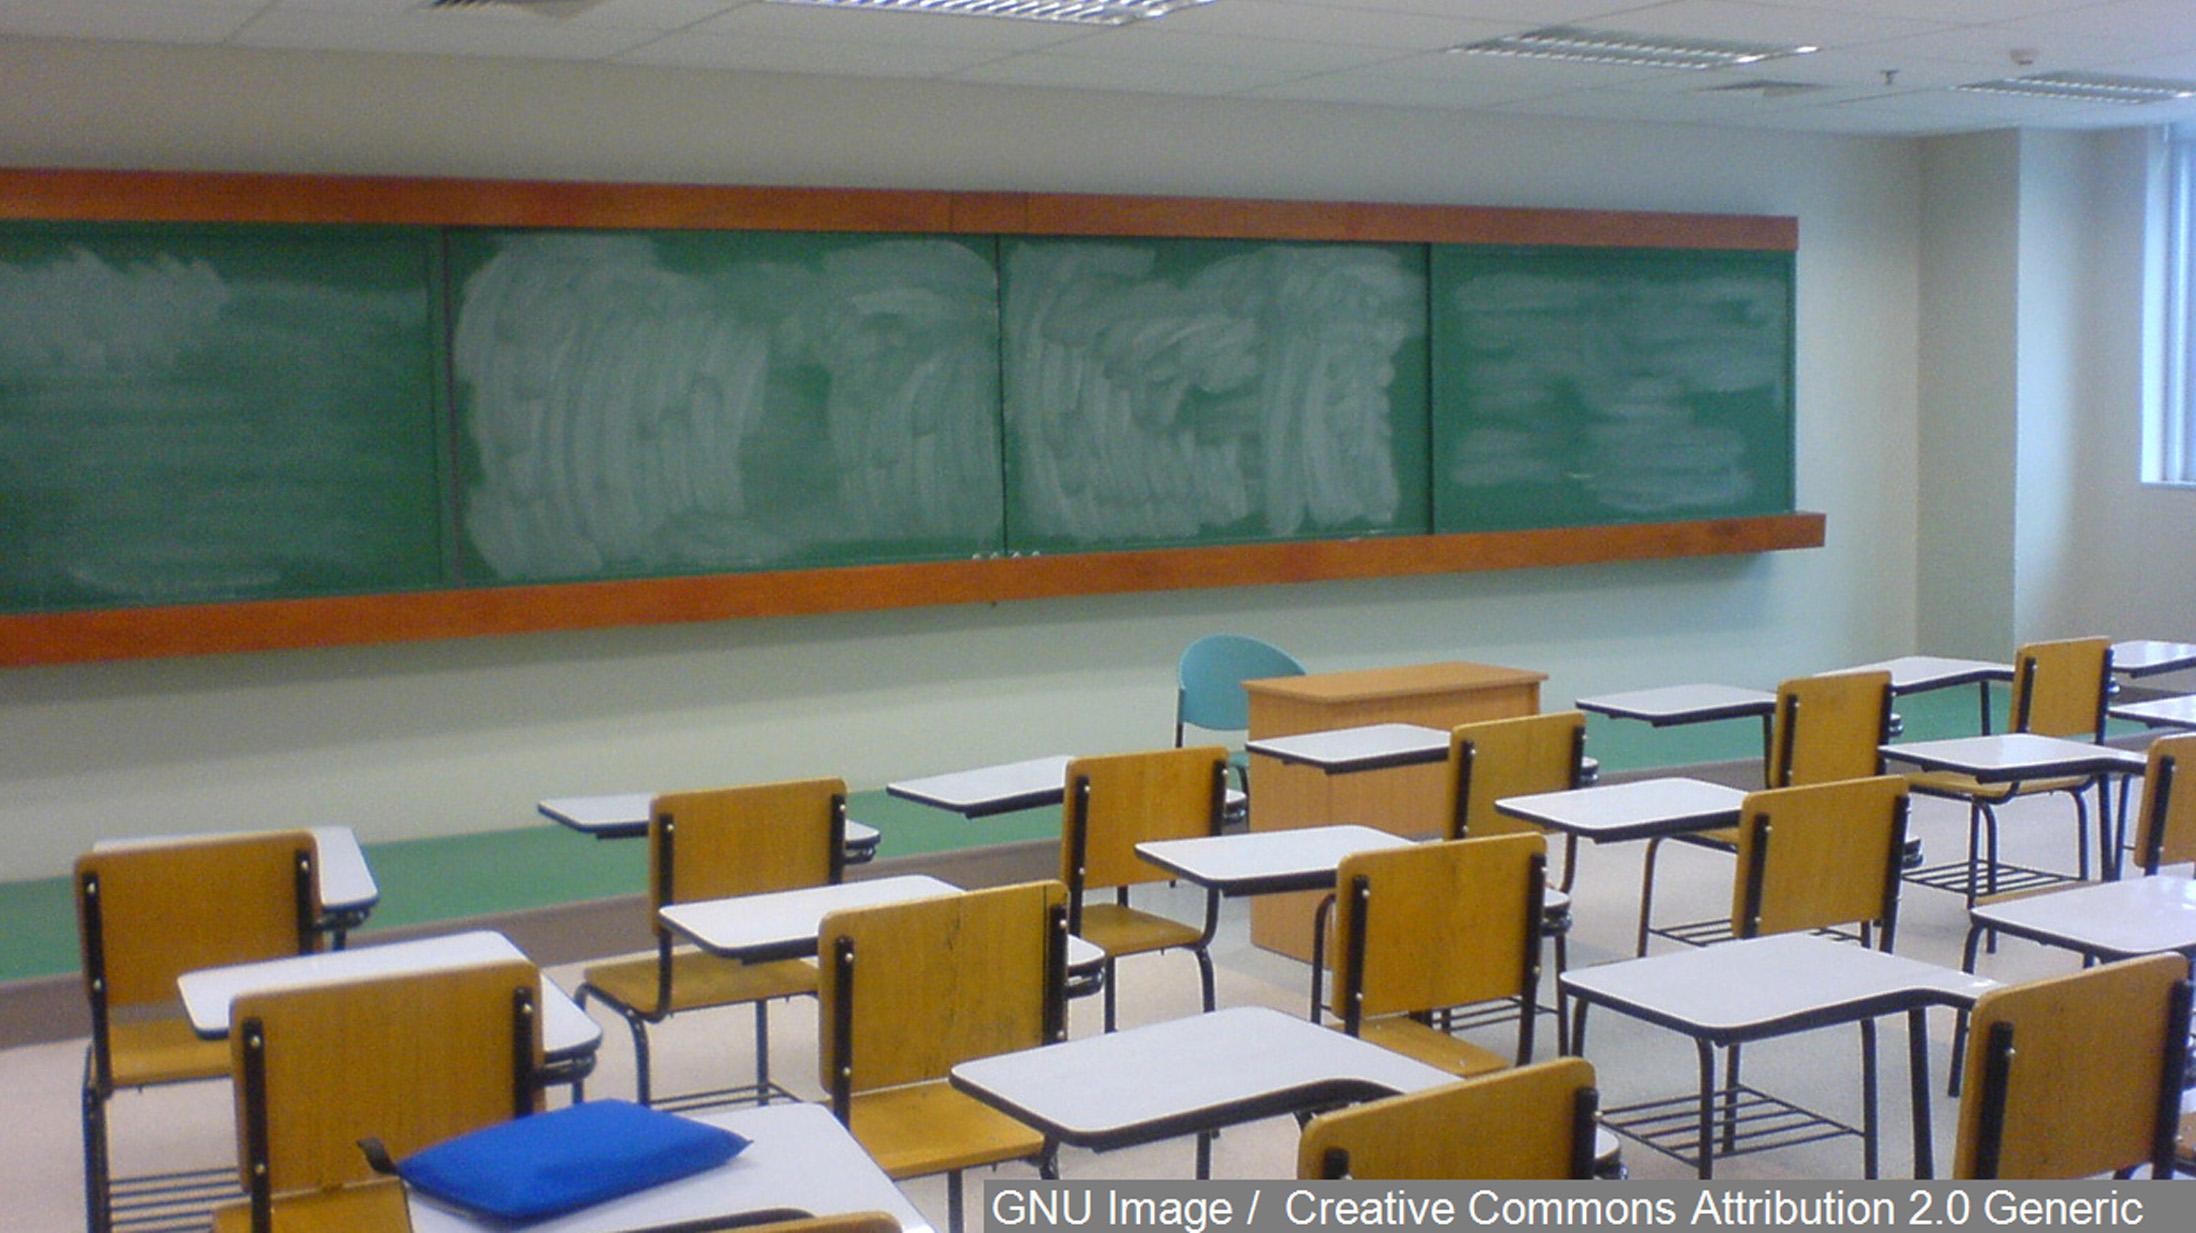 Classroom 10122015_1454471149816.jpg